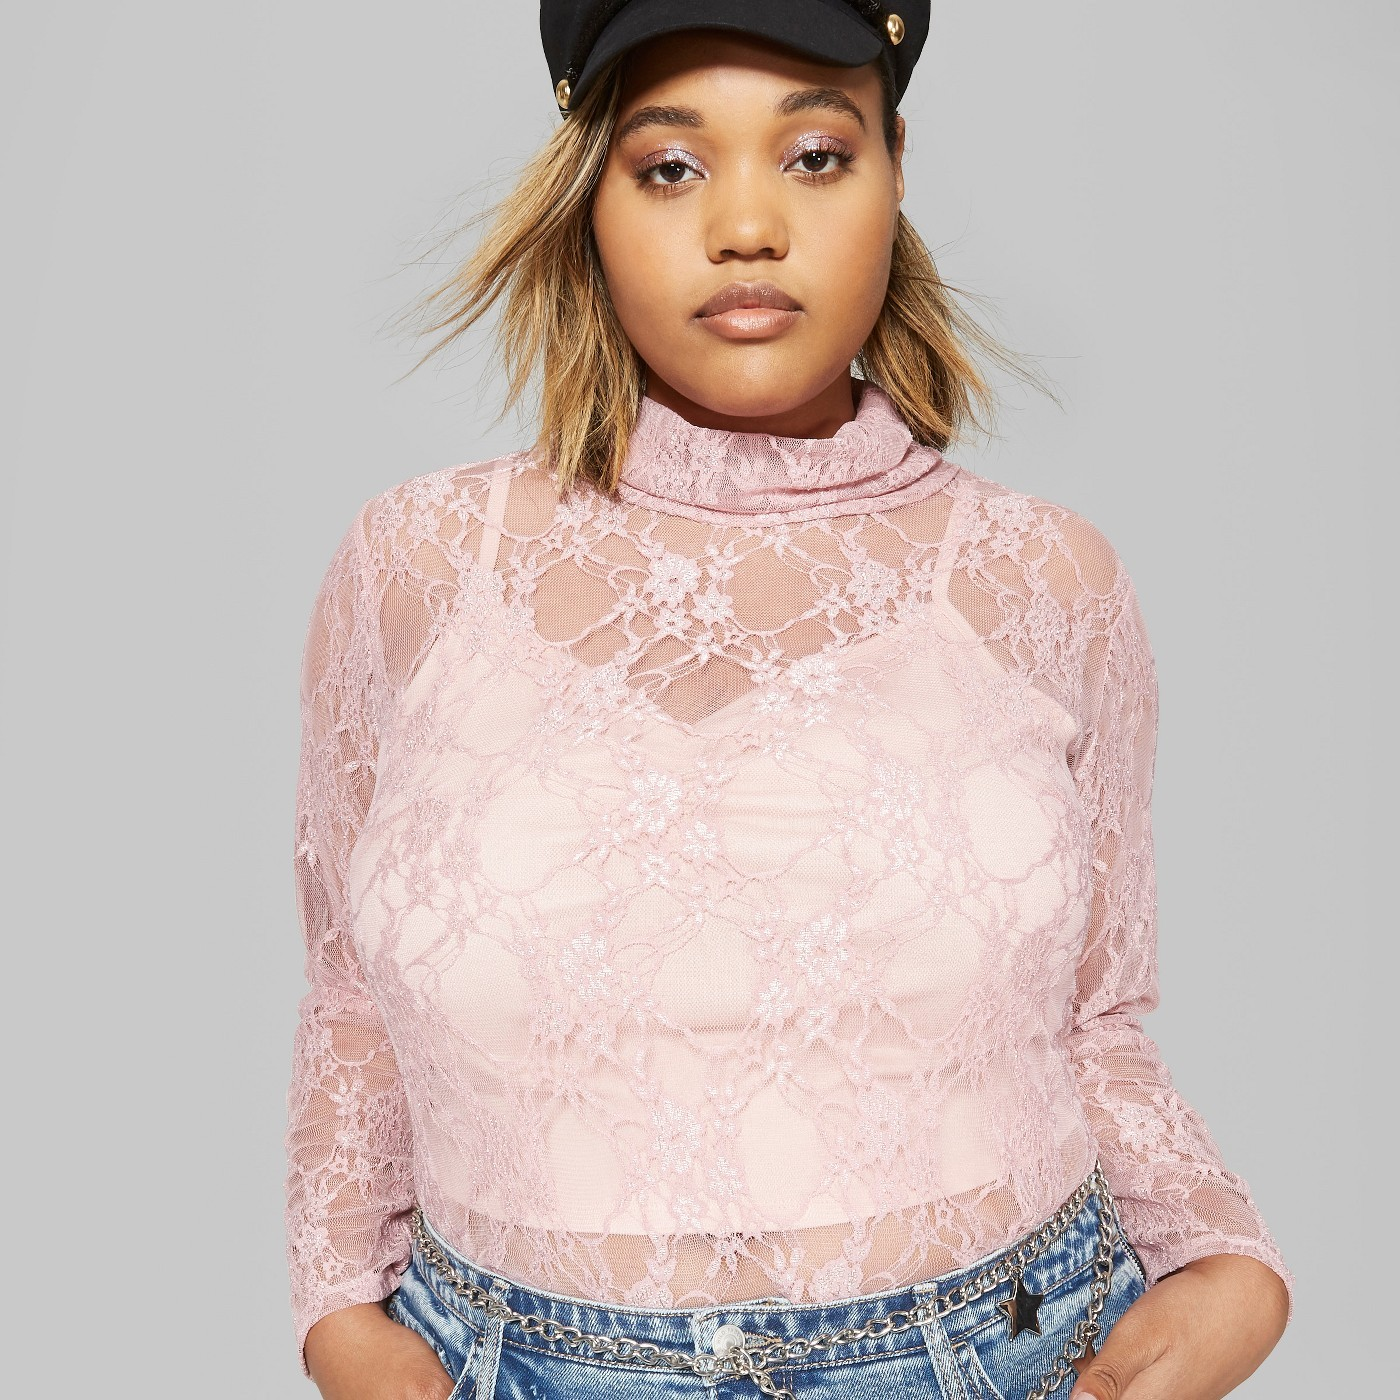 ac0963c41b9d8b Womens Plus Size Blouses At Target   RLDM